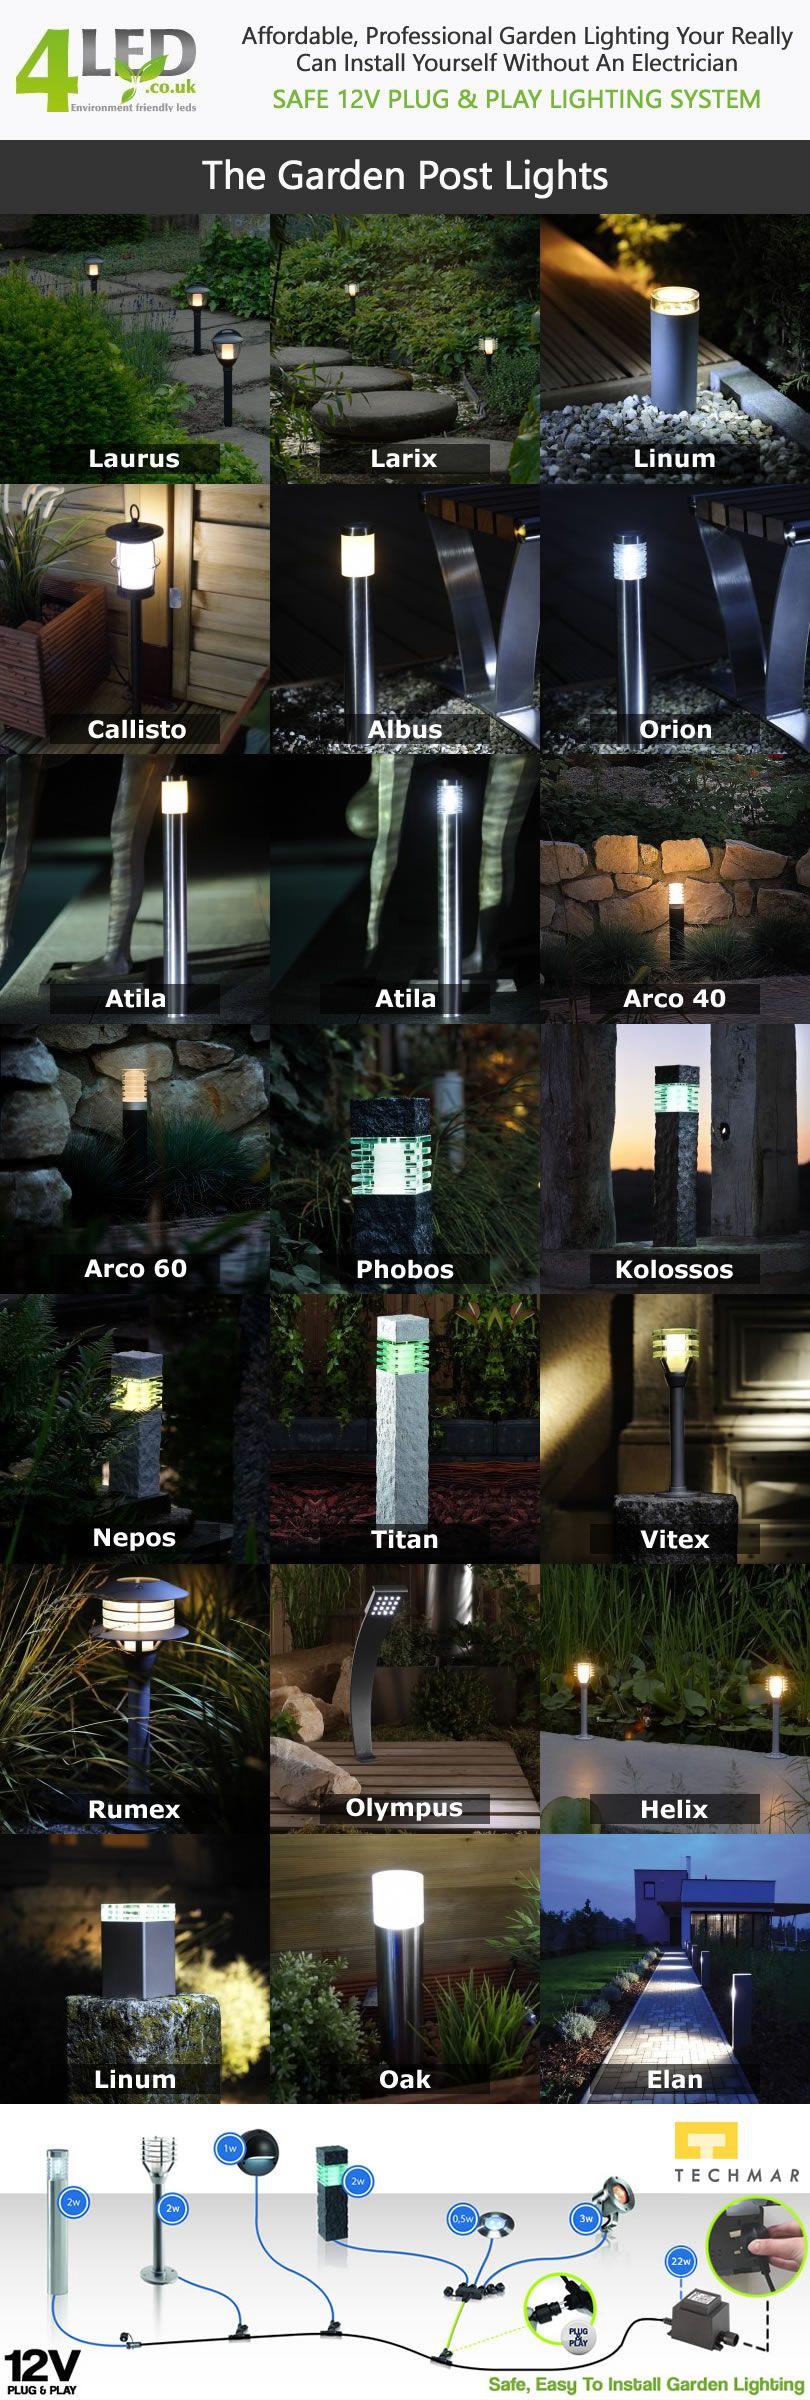 led garden lights 12v on 16 Solar Topiary Tree Ideas In 2021 Topiary Trees Solar Topiary